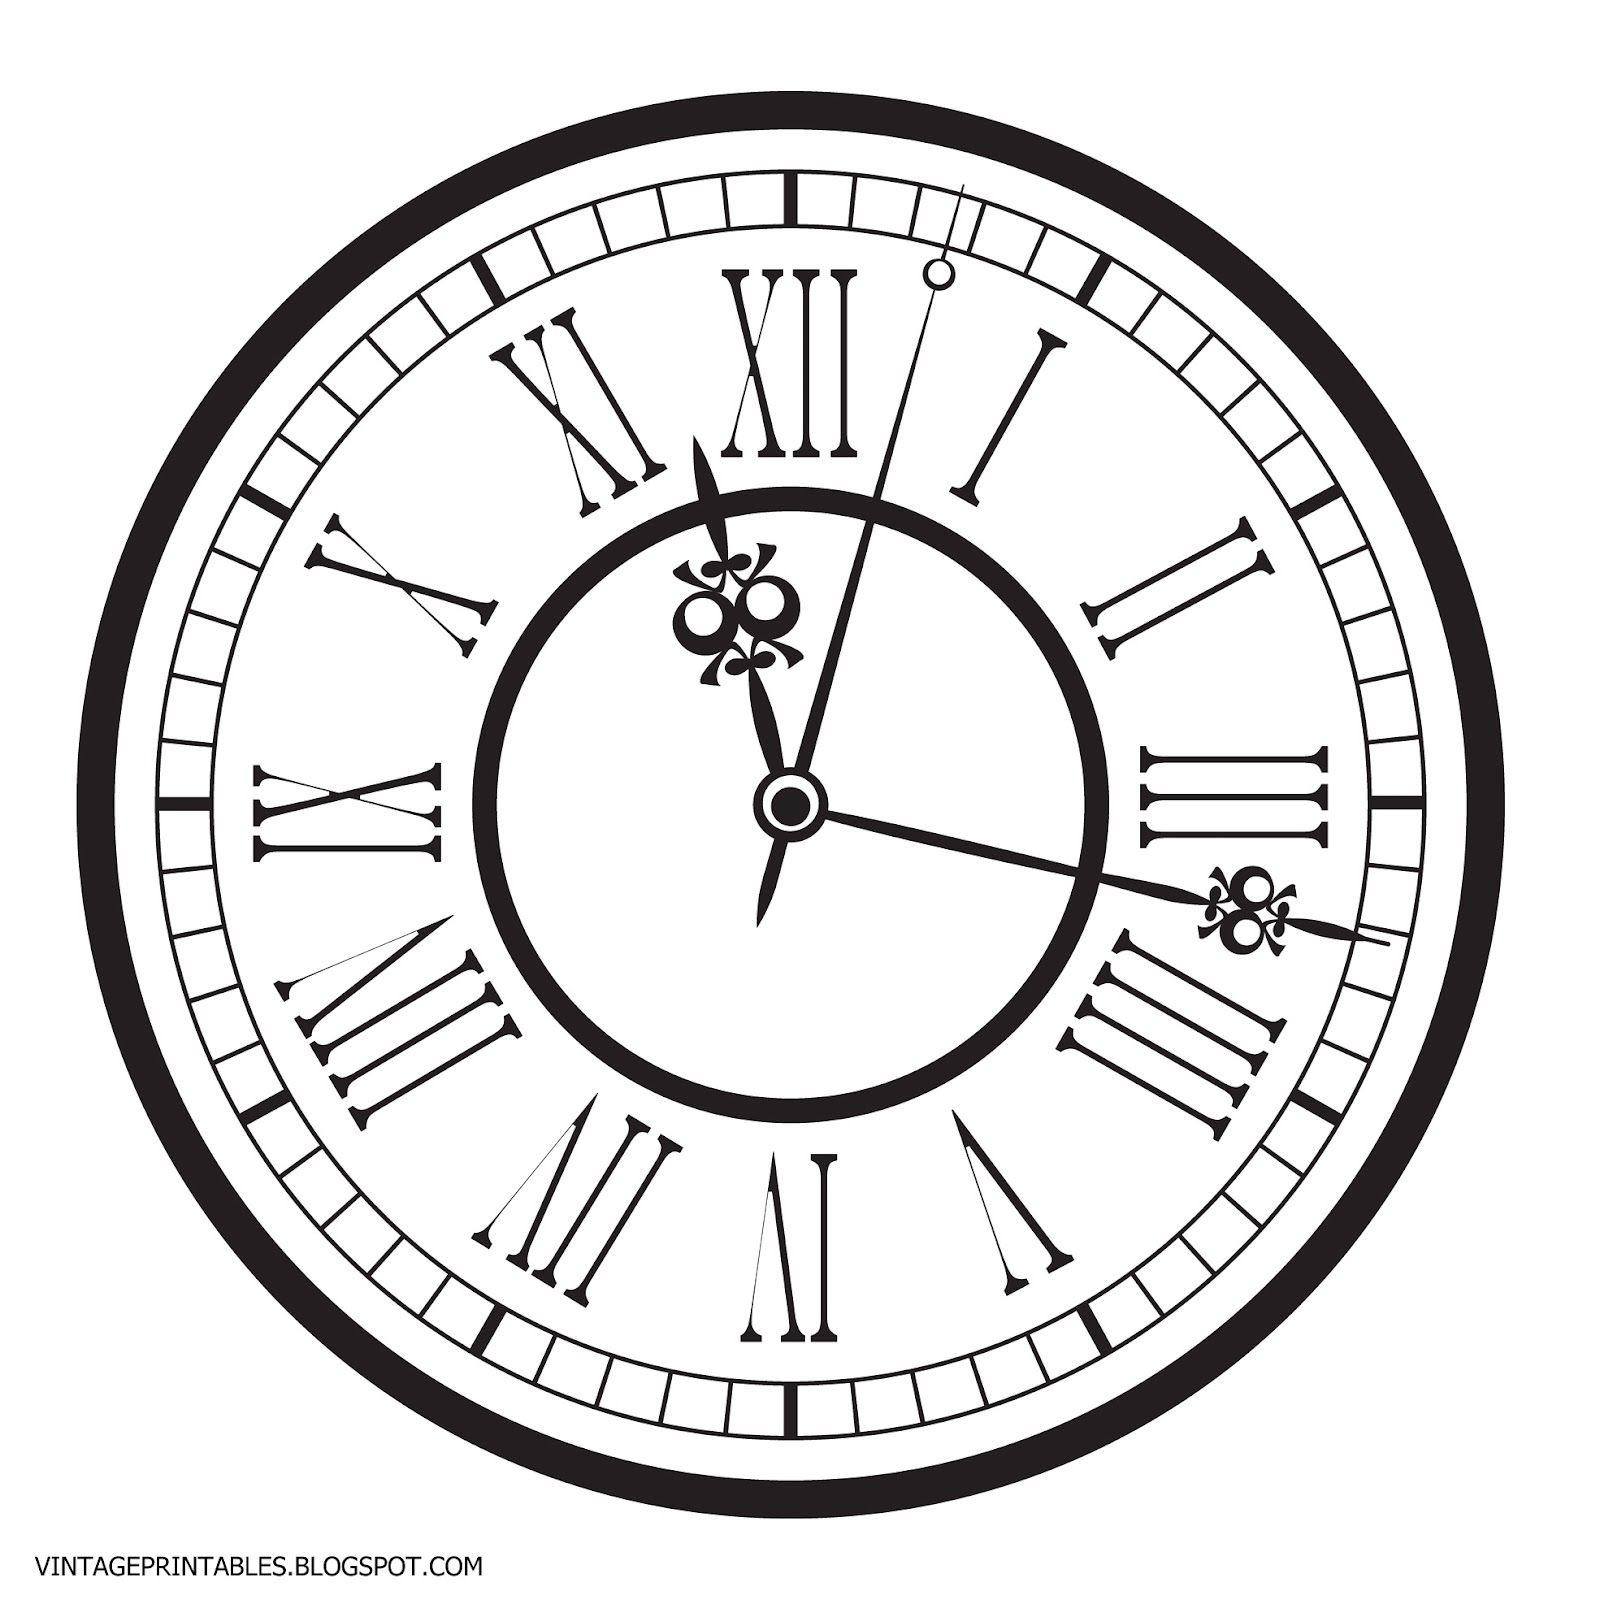 Free Vintage Clip Art Images Old Antique Clock Free Clip